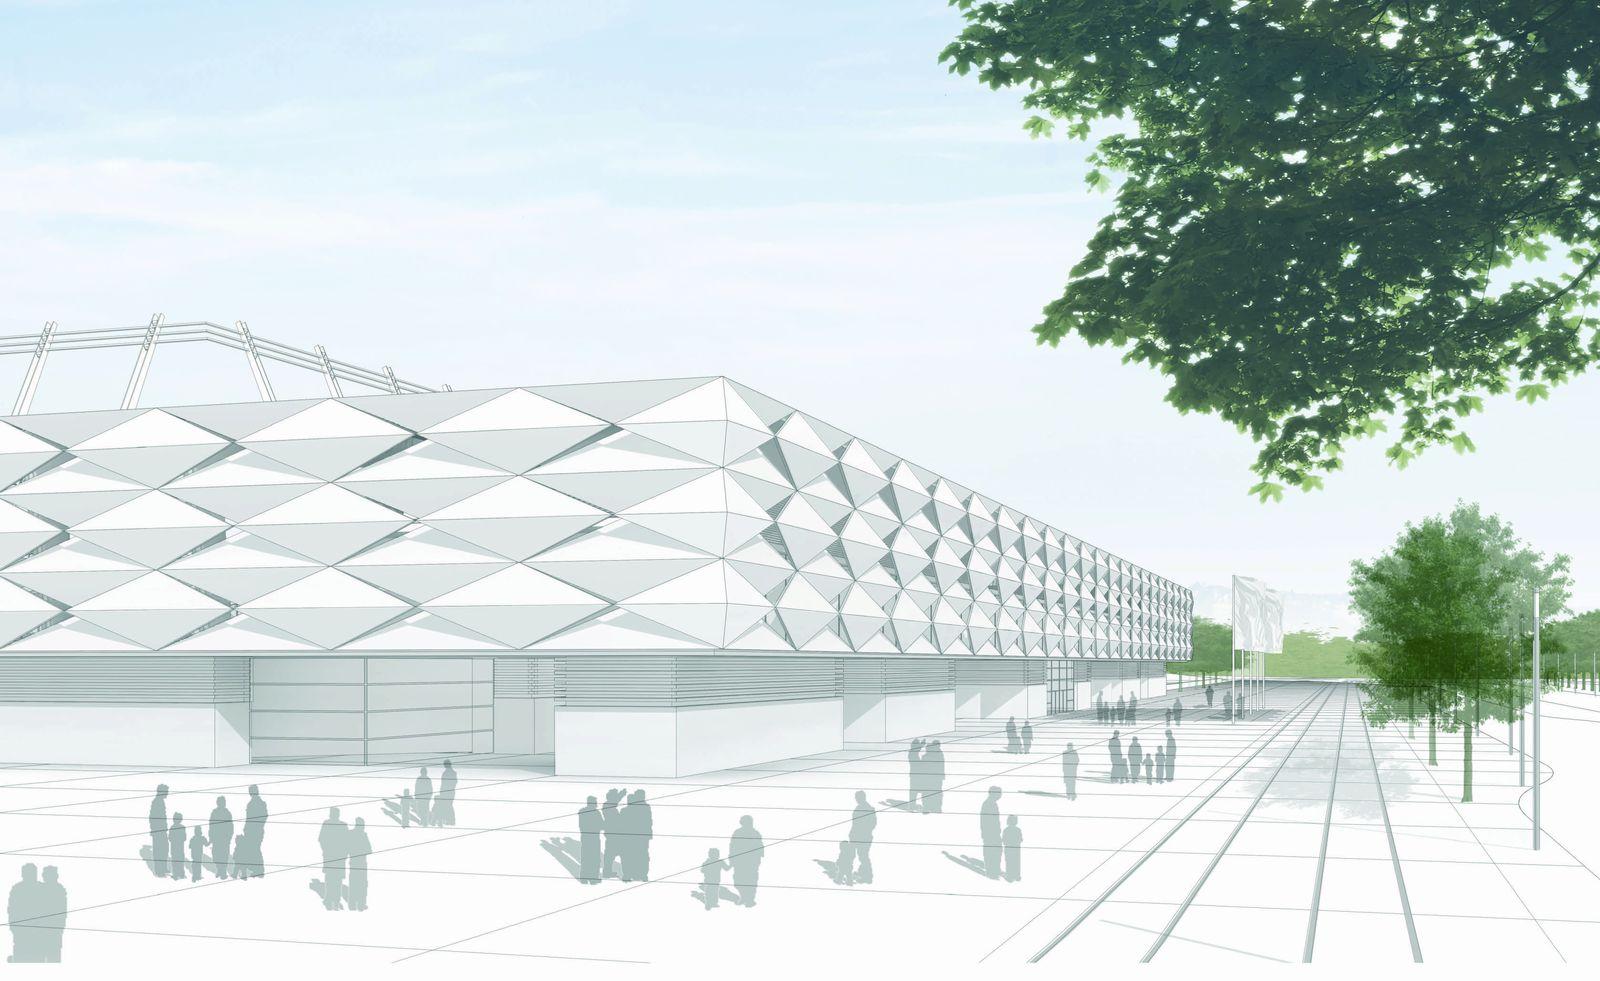 Projekt stade national de luxembourg - Architekten luxemburg ...